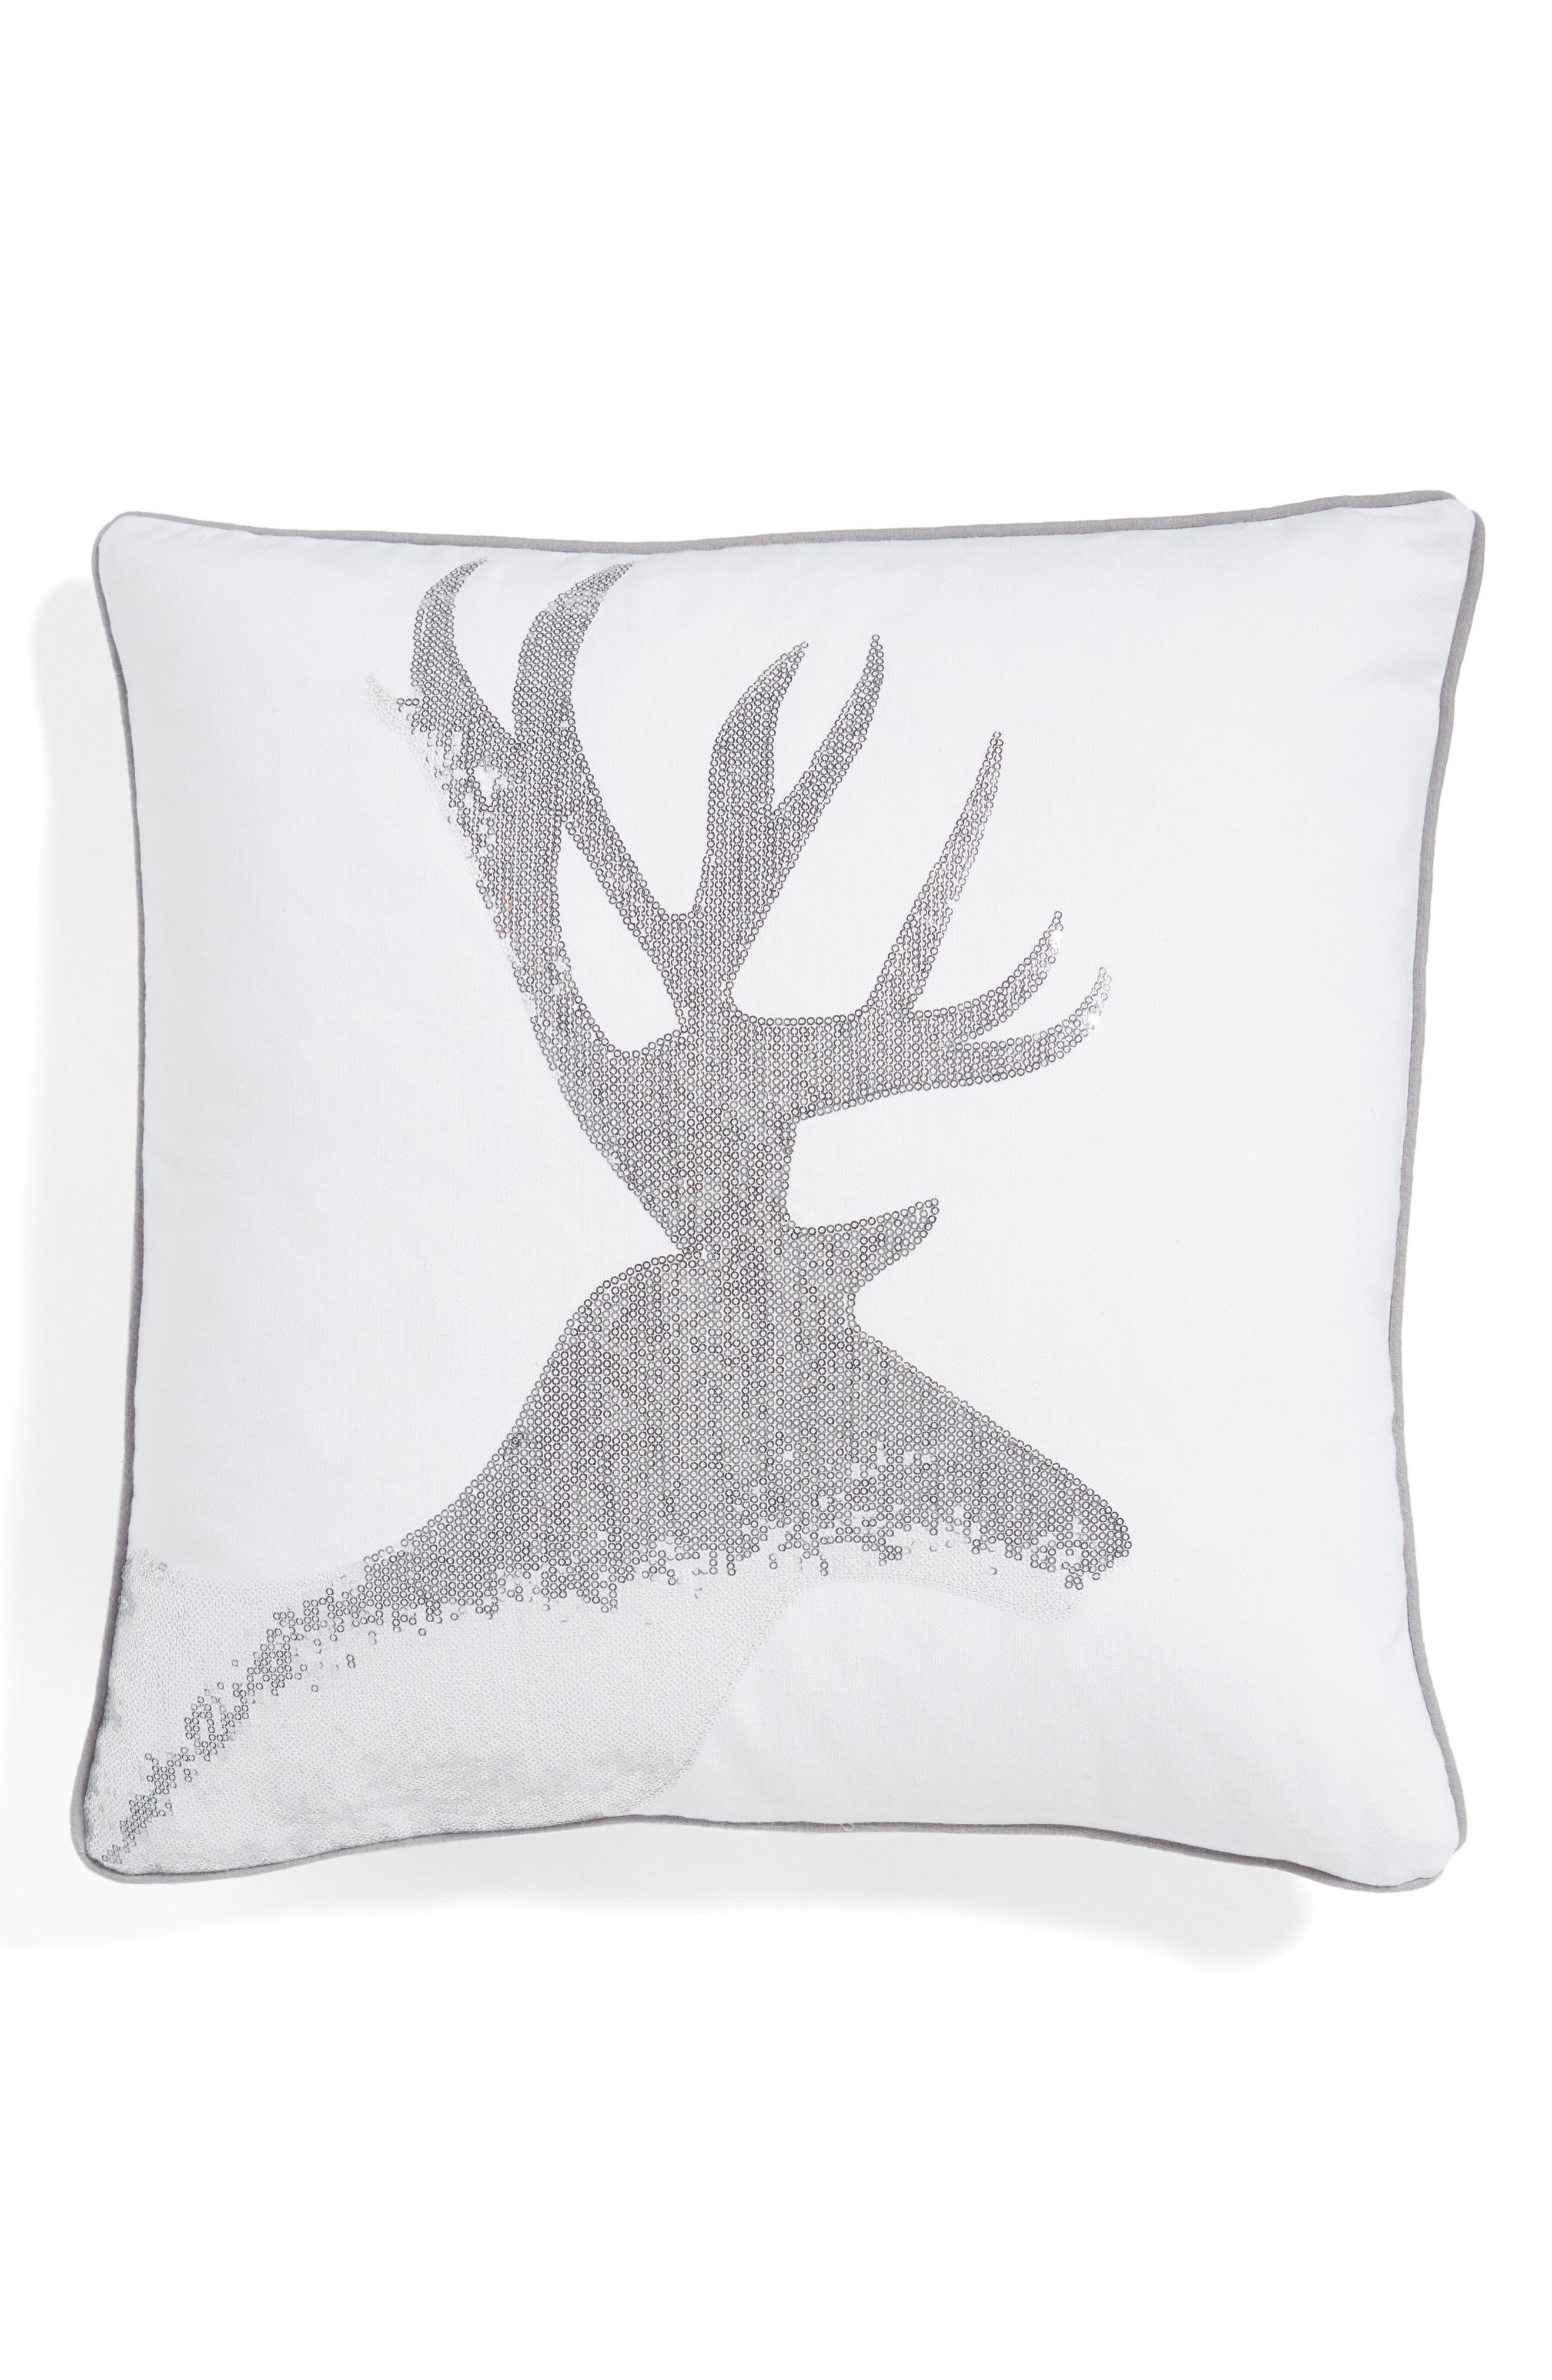 Sequin Reindeer Pillow,                             Main thumbnail 1, color,                             100